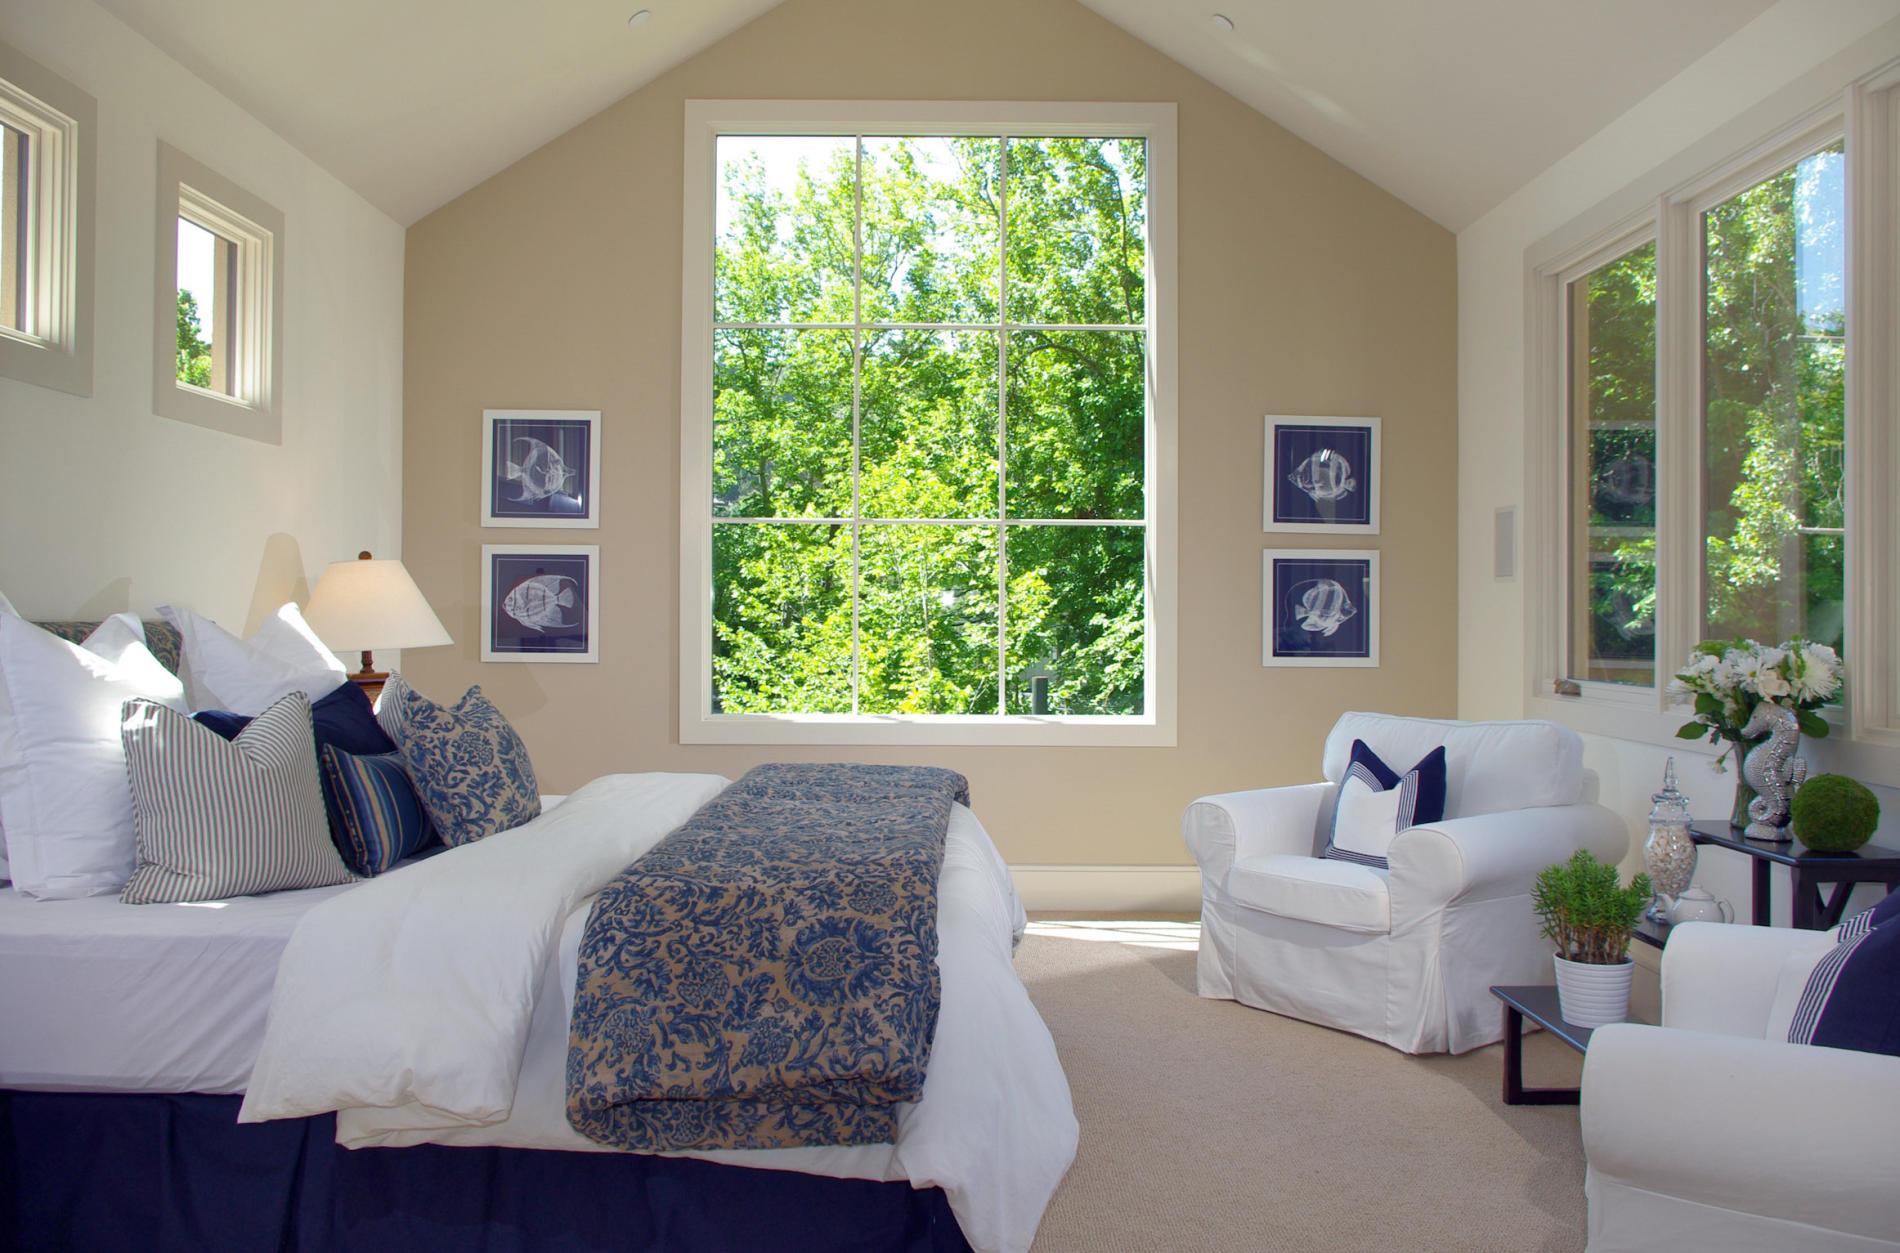 coastal wall decor bedroom